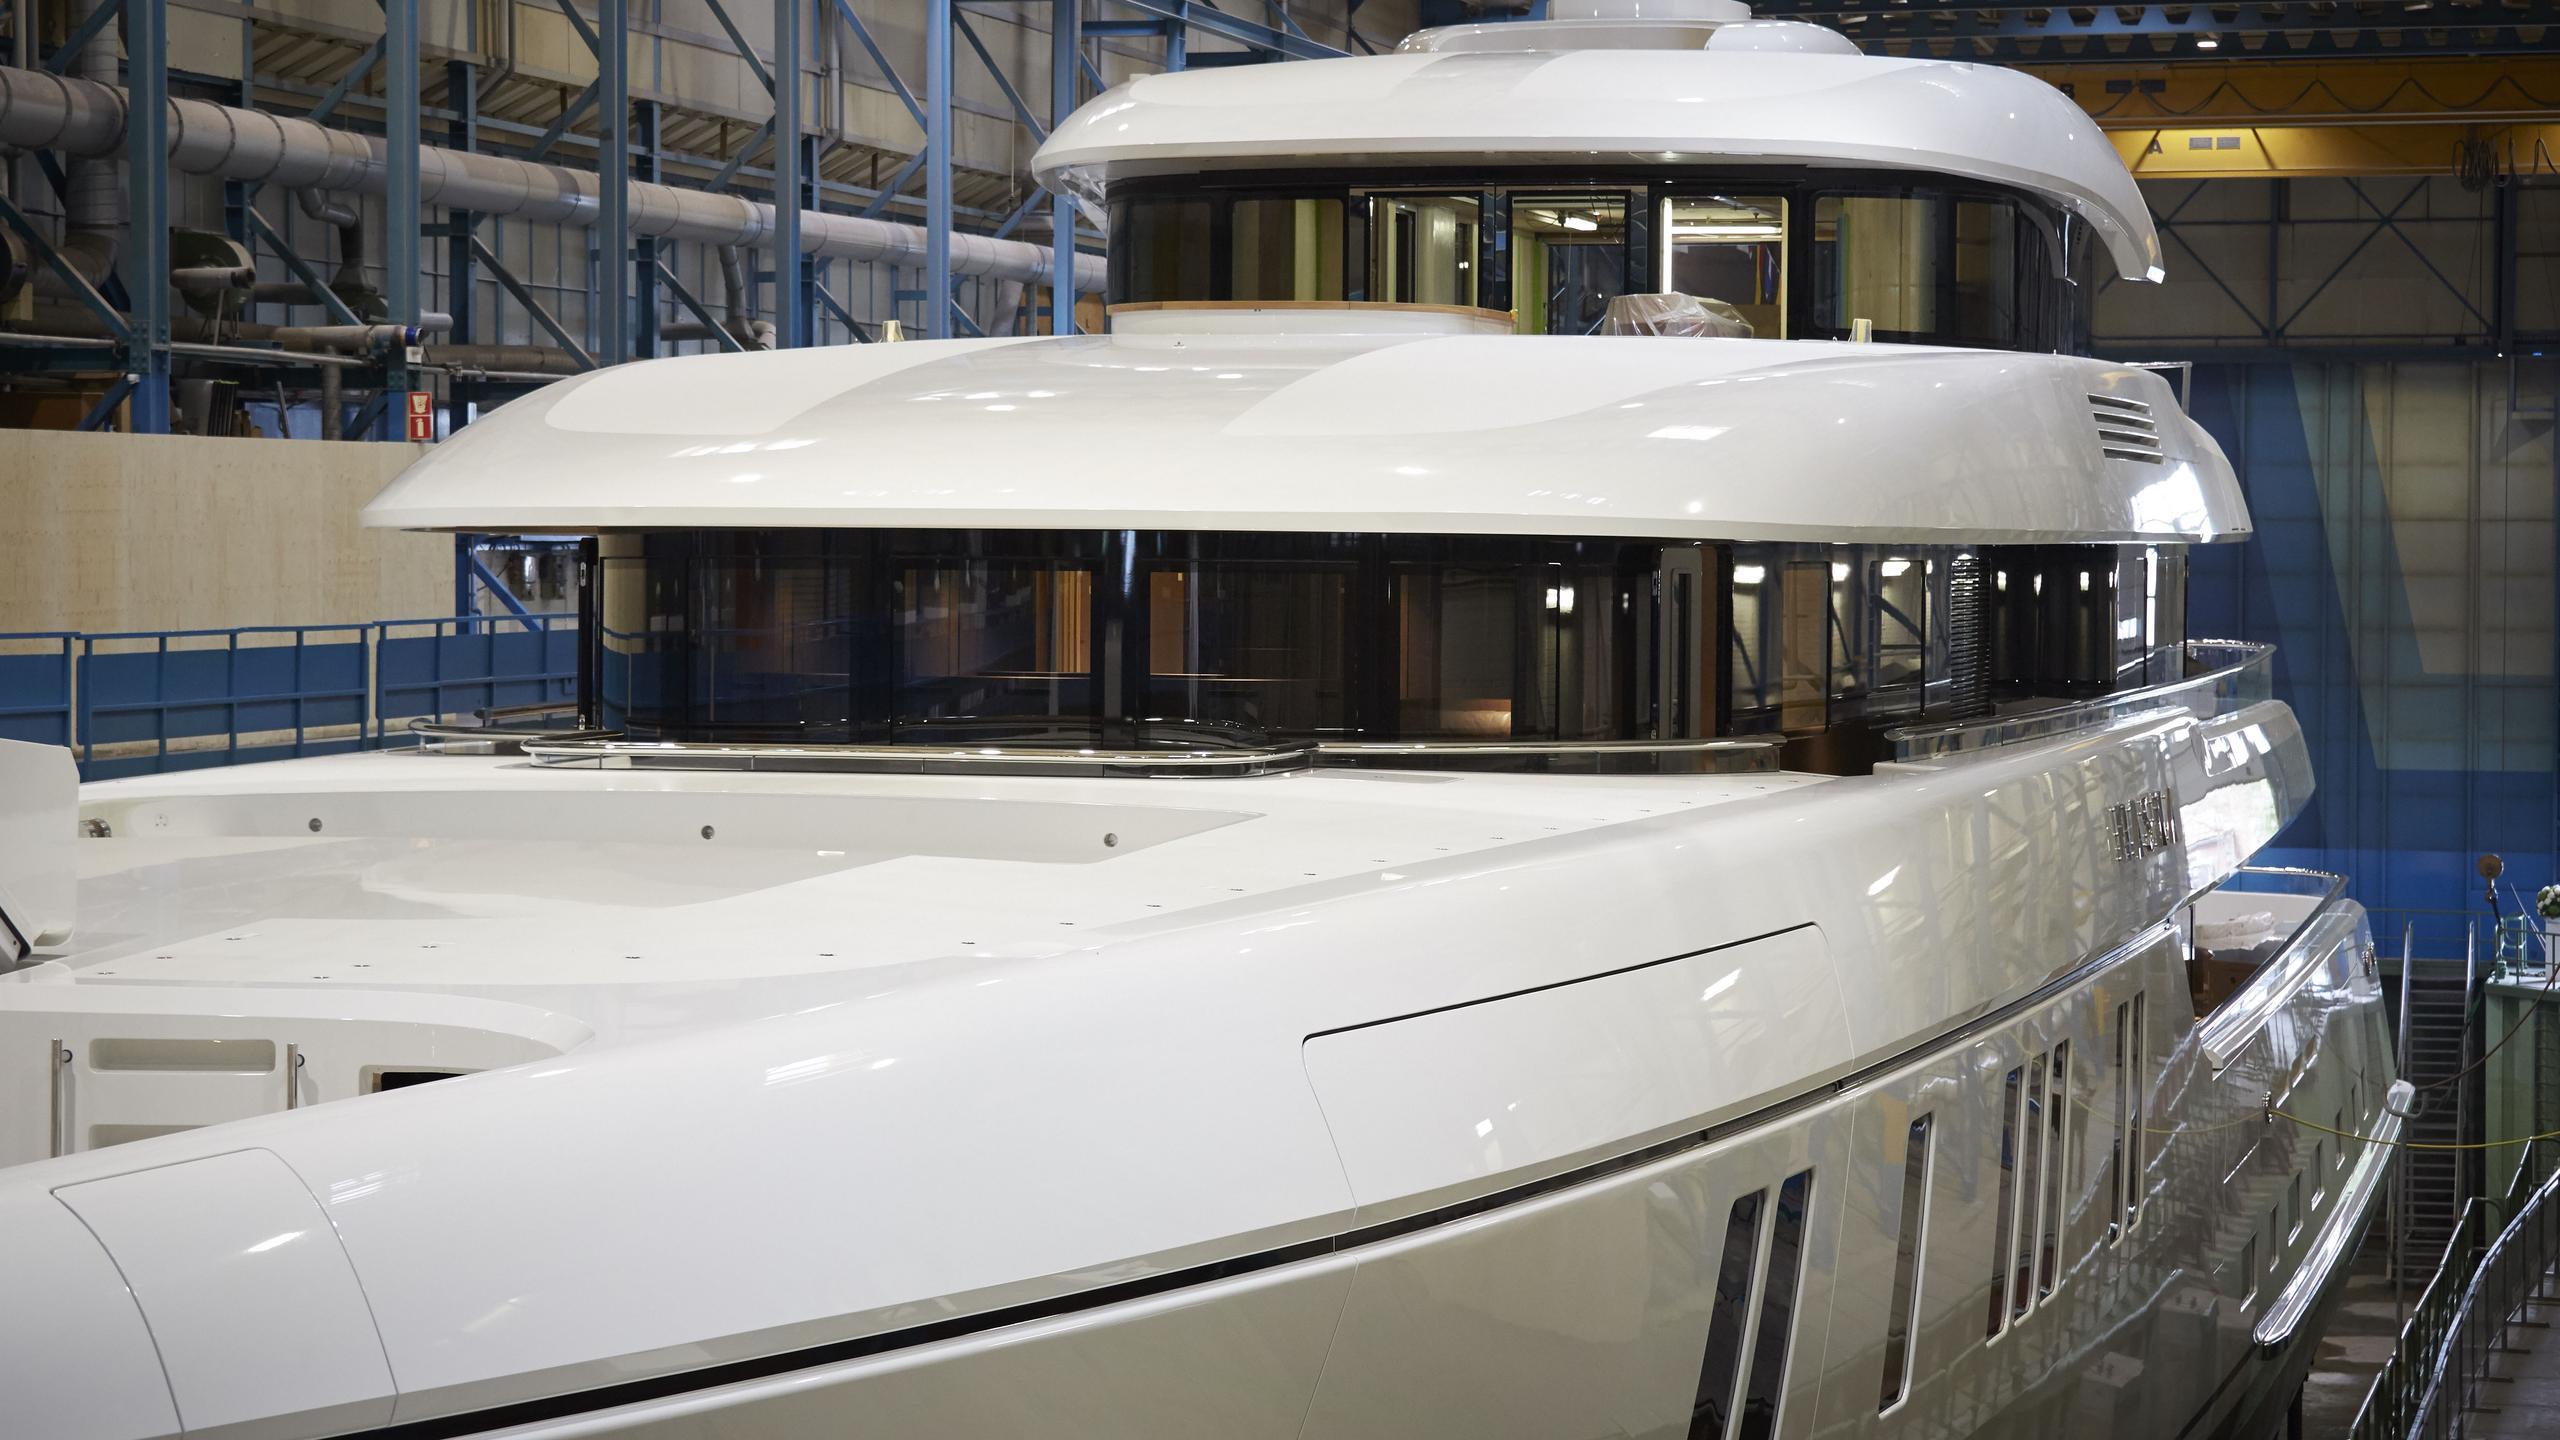 hasna motoryacht feadship 73m 2017 launch half profile